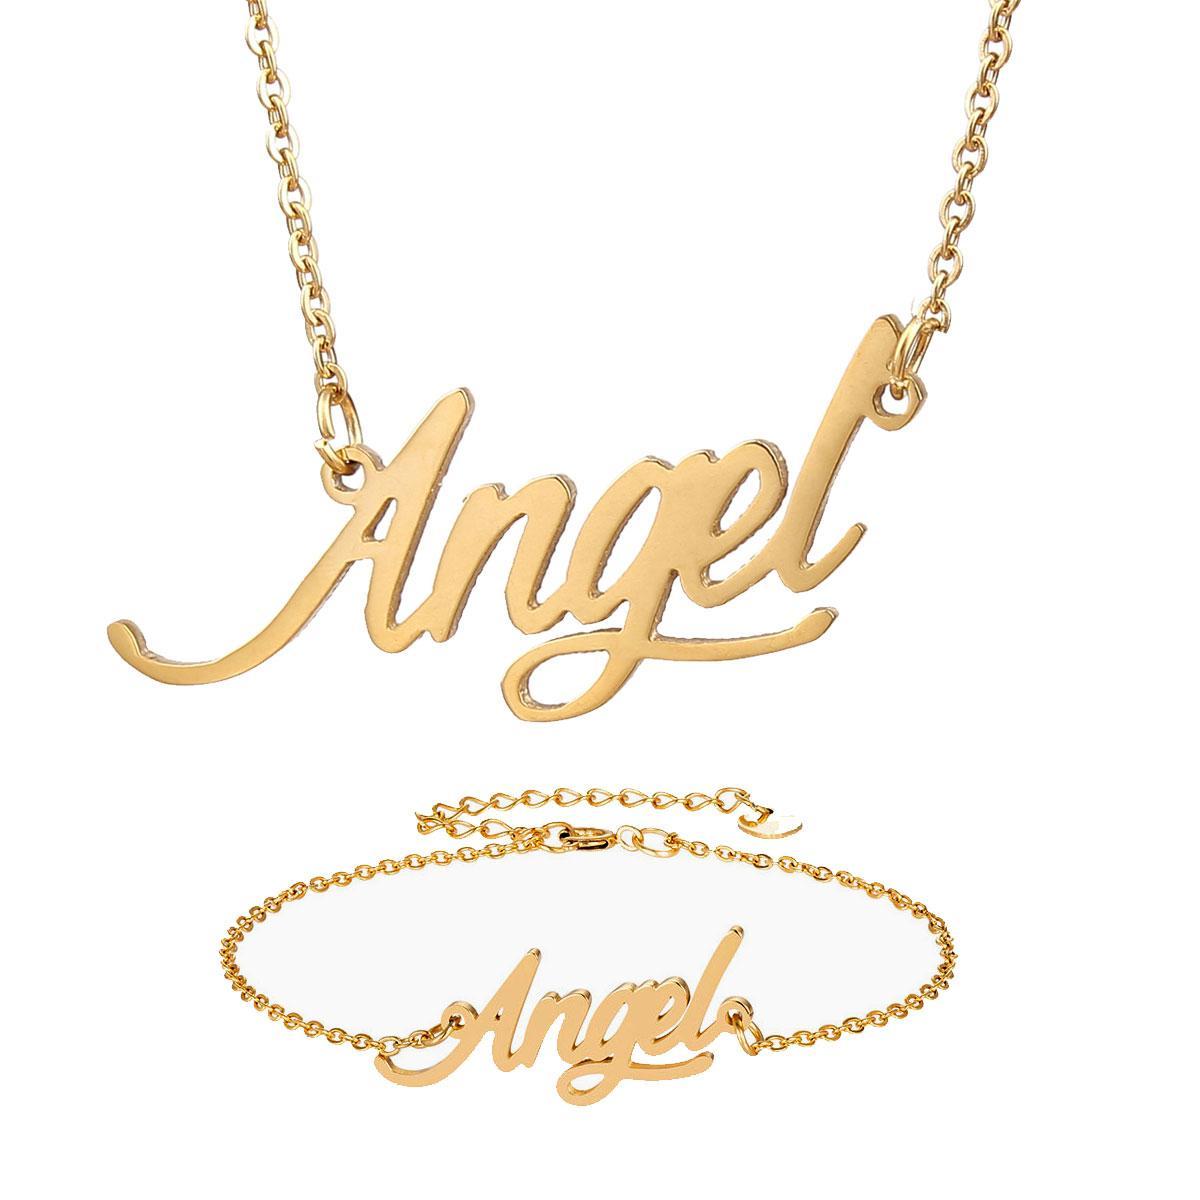 "Fashion Schmuck Frauen-Edelstahl-Namenskette + Armband Set ""Engel"" Script Letter Goldchoker Halskette Anhänger Geschenk Typschild"